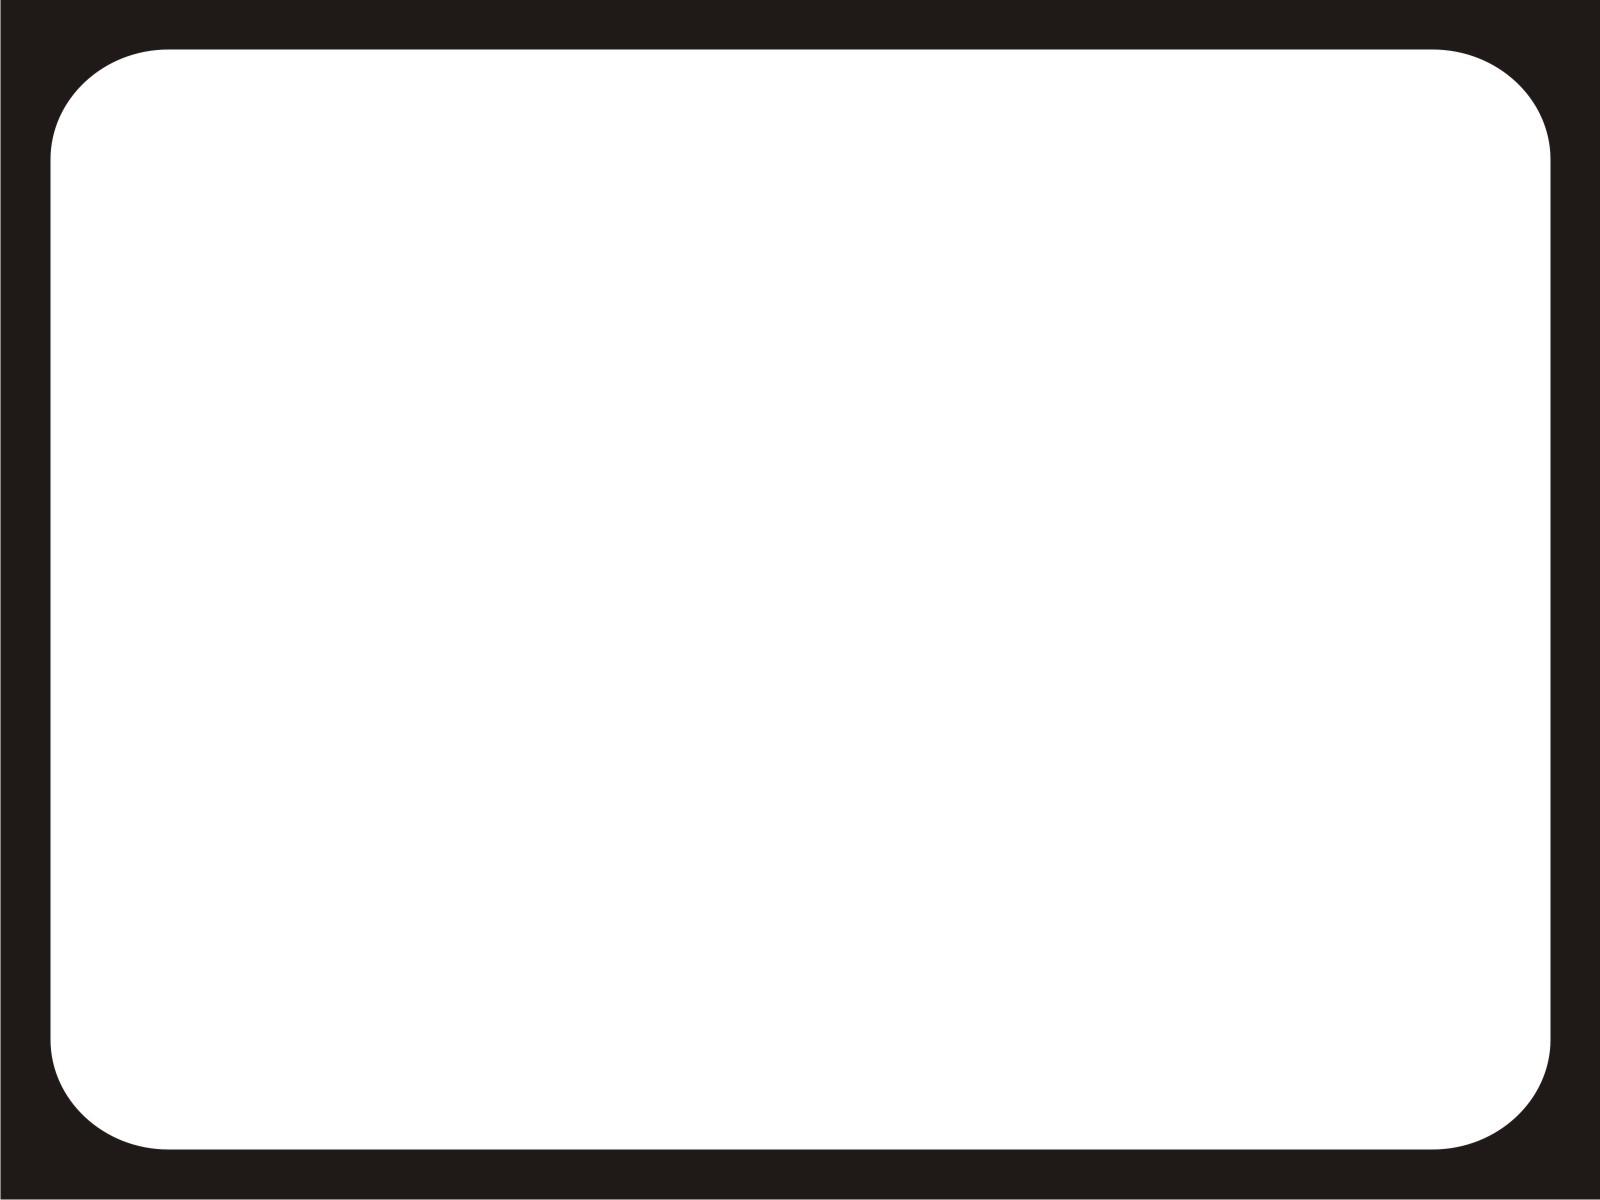 clip art business card borders - photo #43